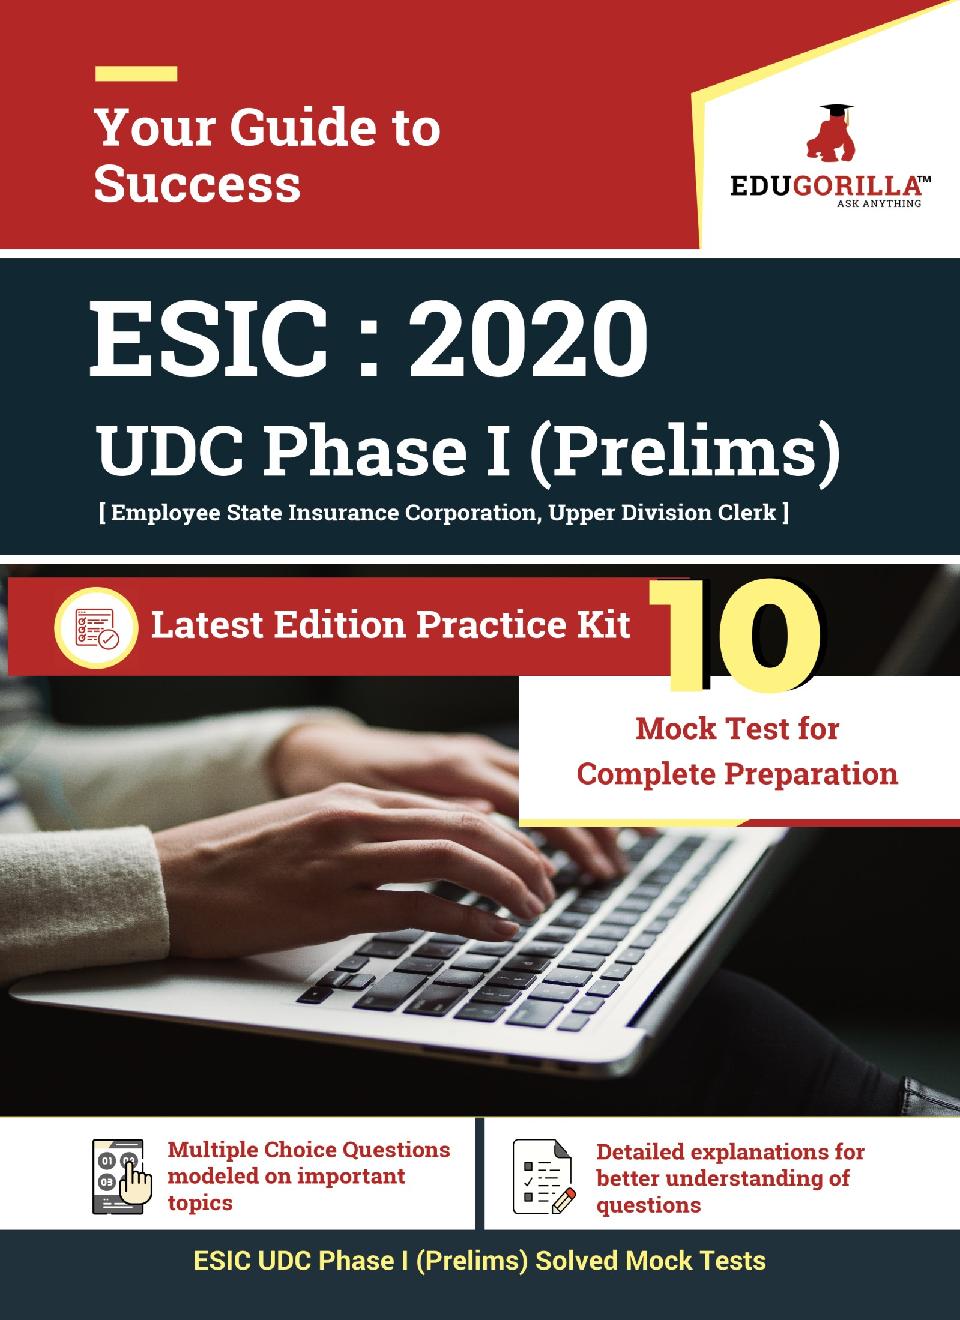 EduGorilla ESIC Upper Division Clerk (UDC) Phase I (Prelims) Recruitment Exam | 10 Mock Test - Page 1